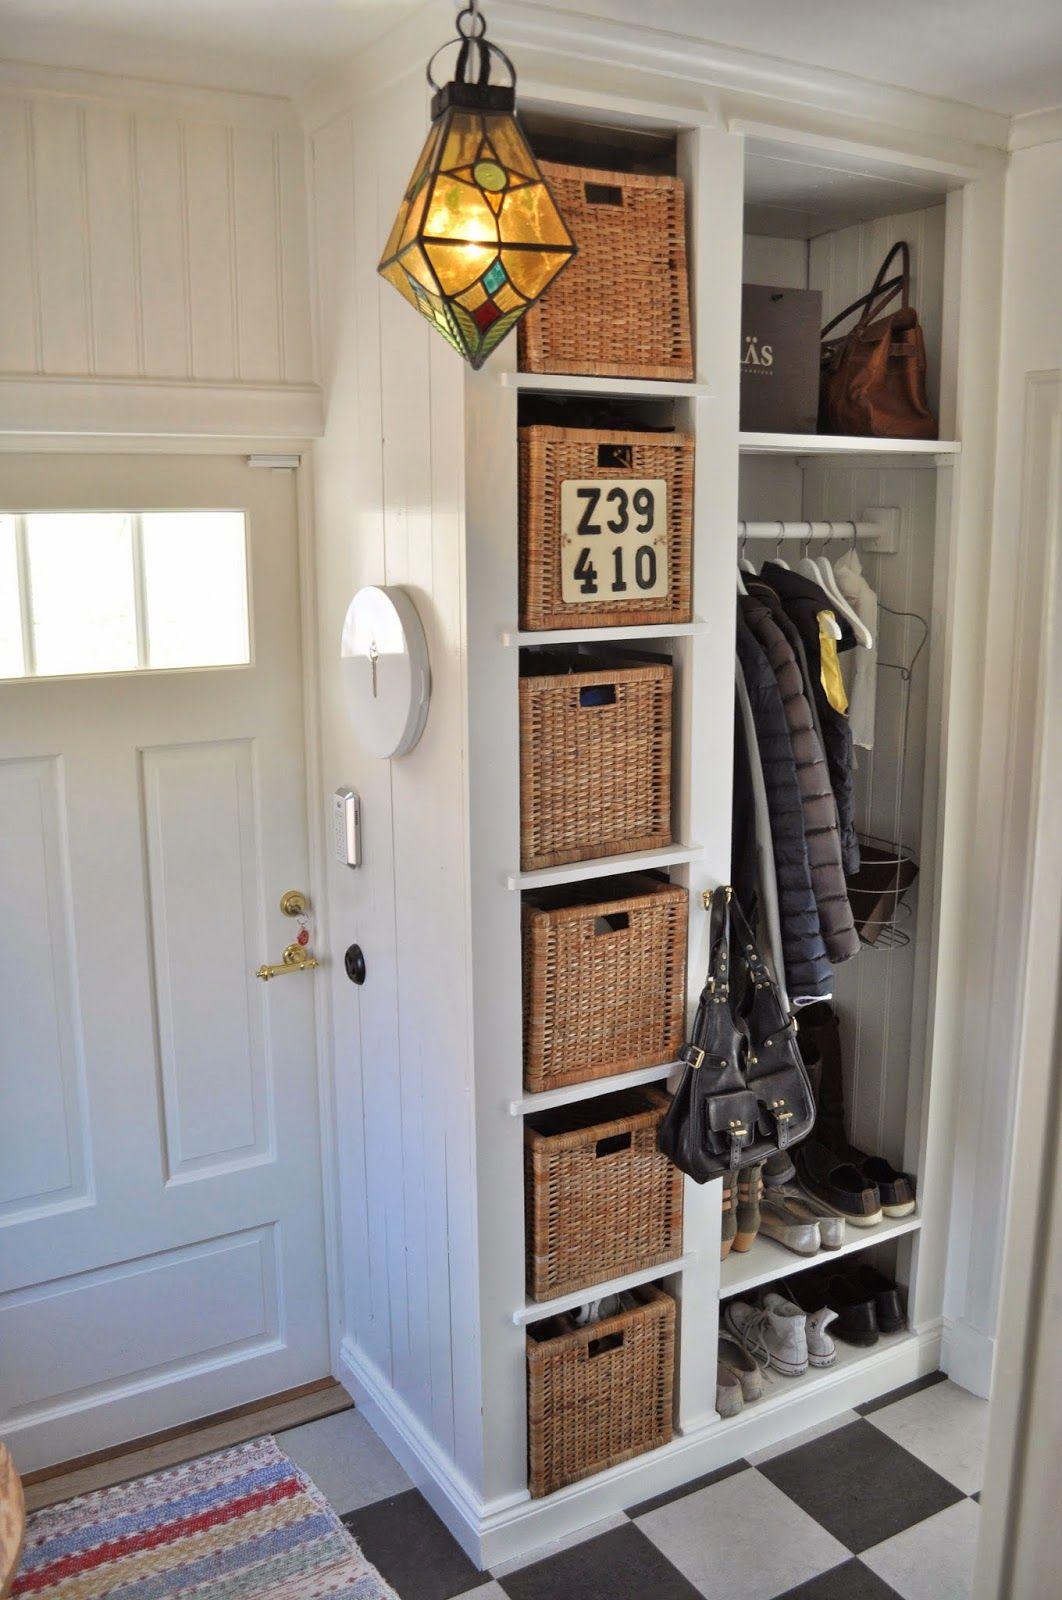 Mud Room Small Entry Storage Solution Coat Rack Craftsman Lighting Checkered Floor